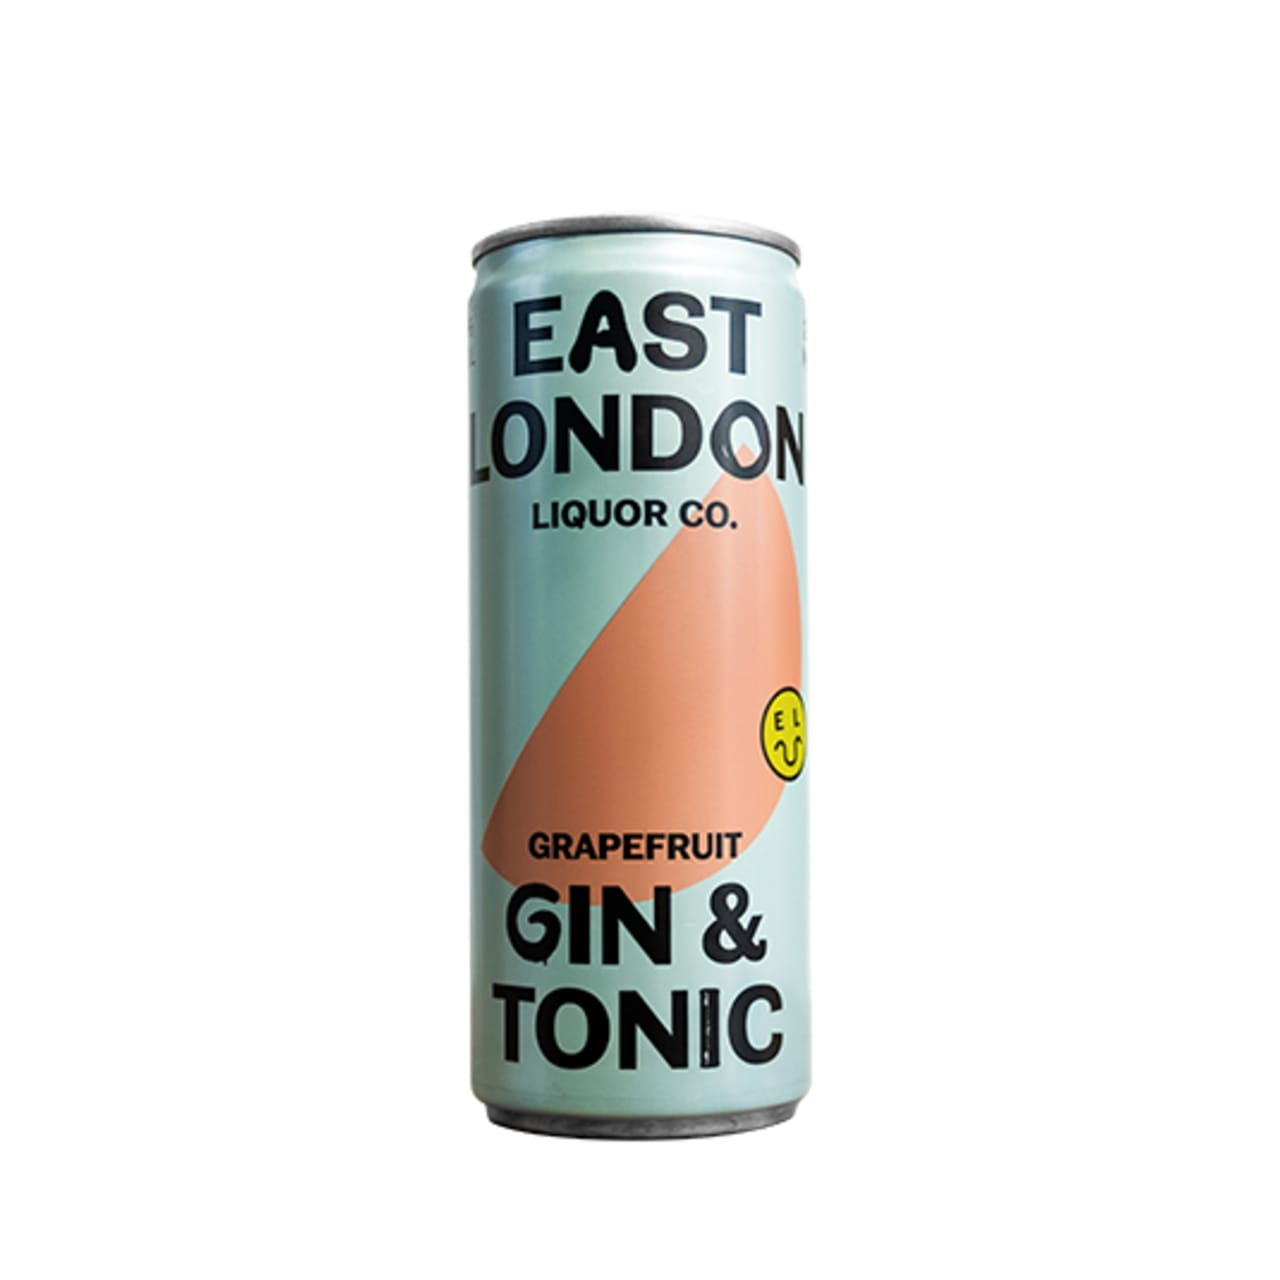 Product Image - ELLC Grapefruit Gin & Tonic Can